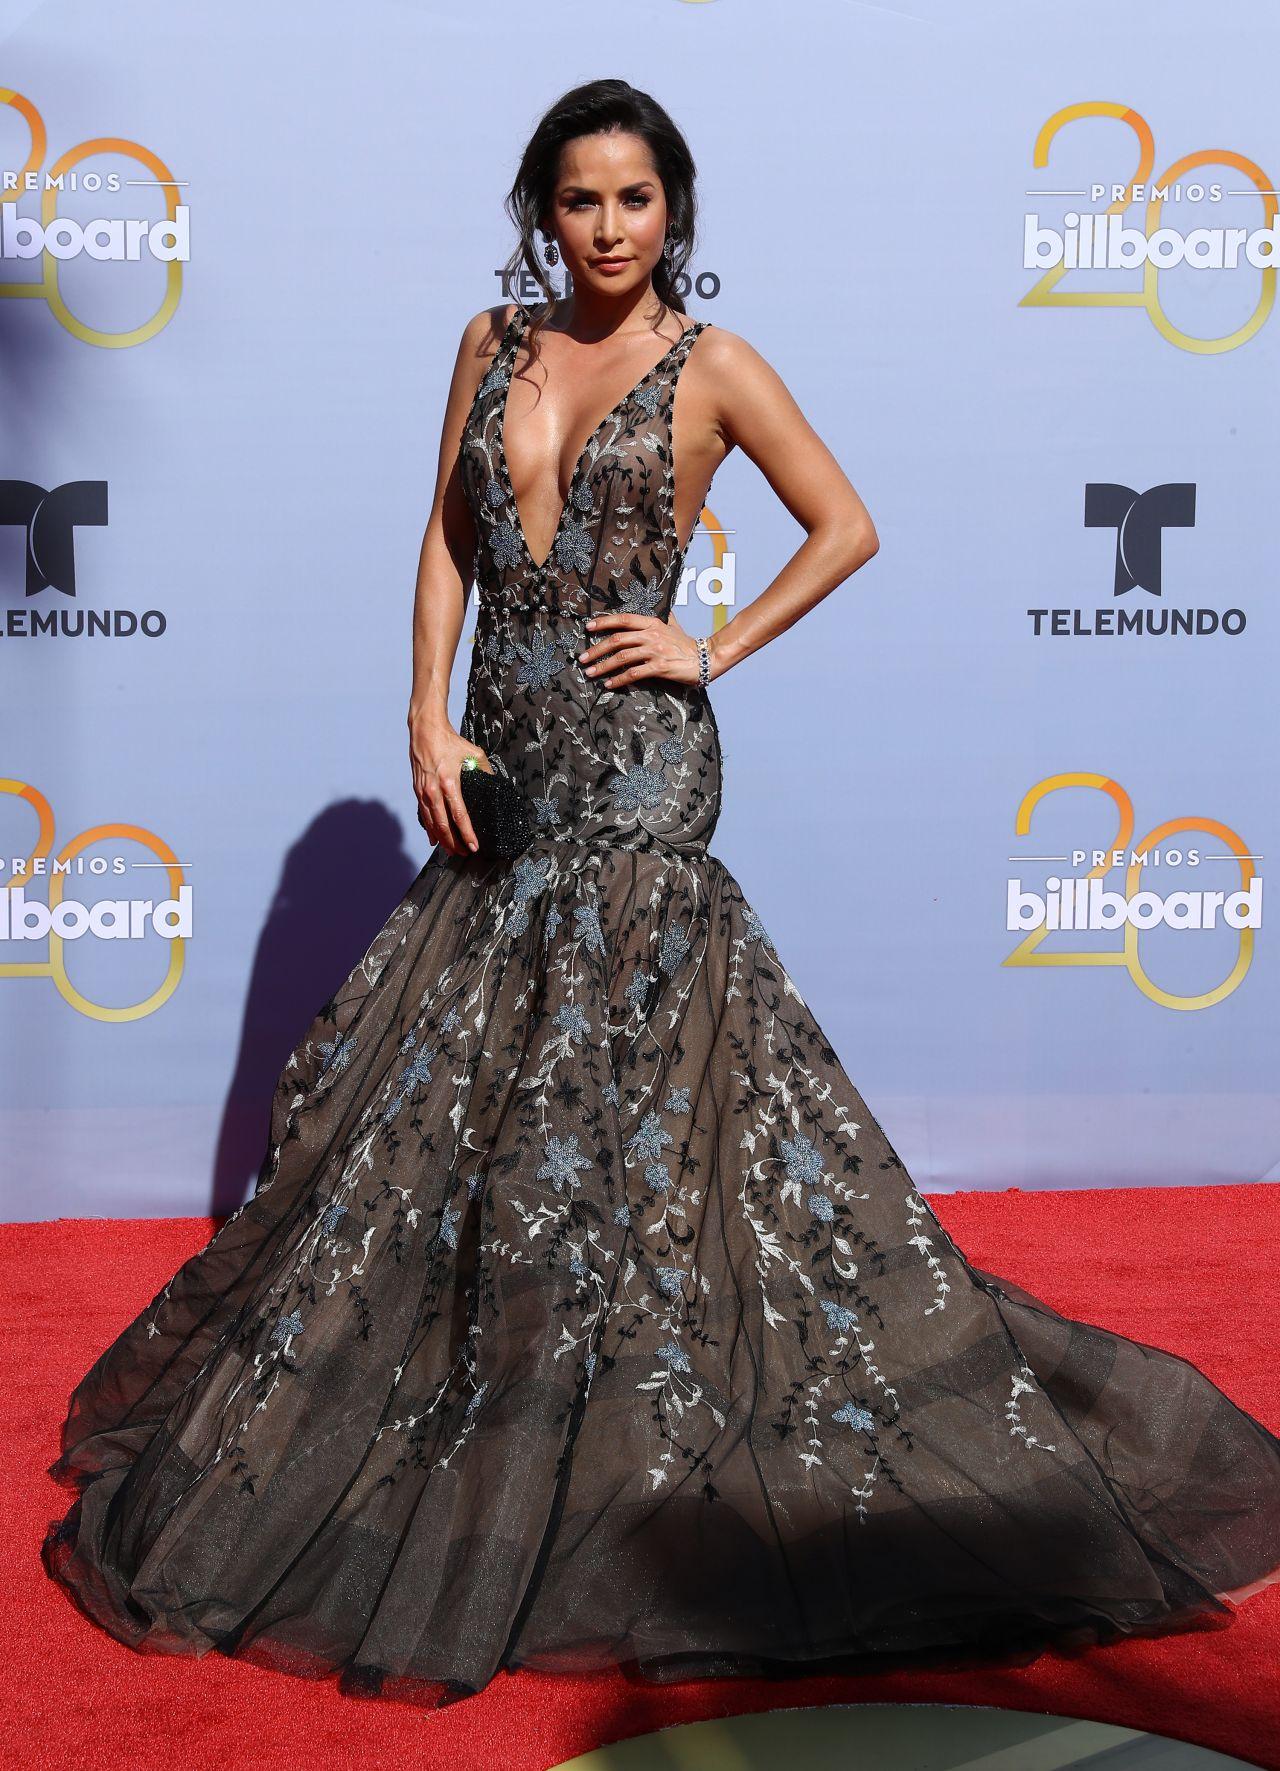 http://celebmafia.com/wp-content/uploads/2018/04/carmen-villalobos-2018-billboard-latin-music-awards-in-las-vegas-1.jpg